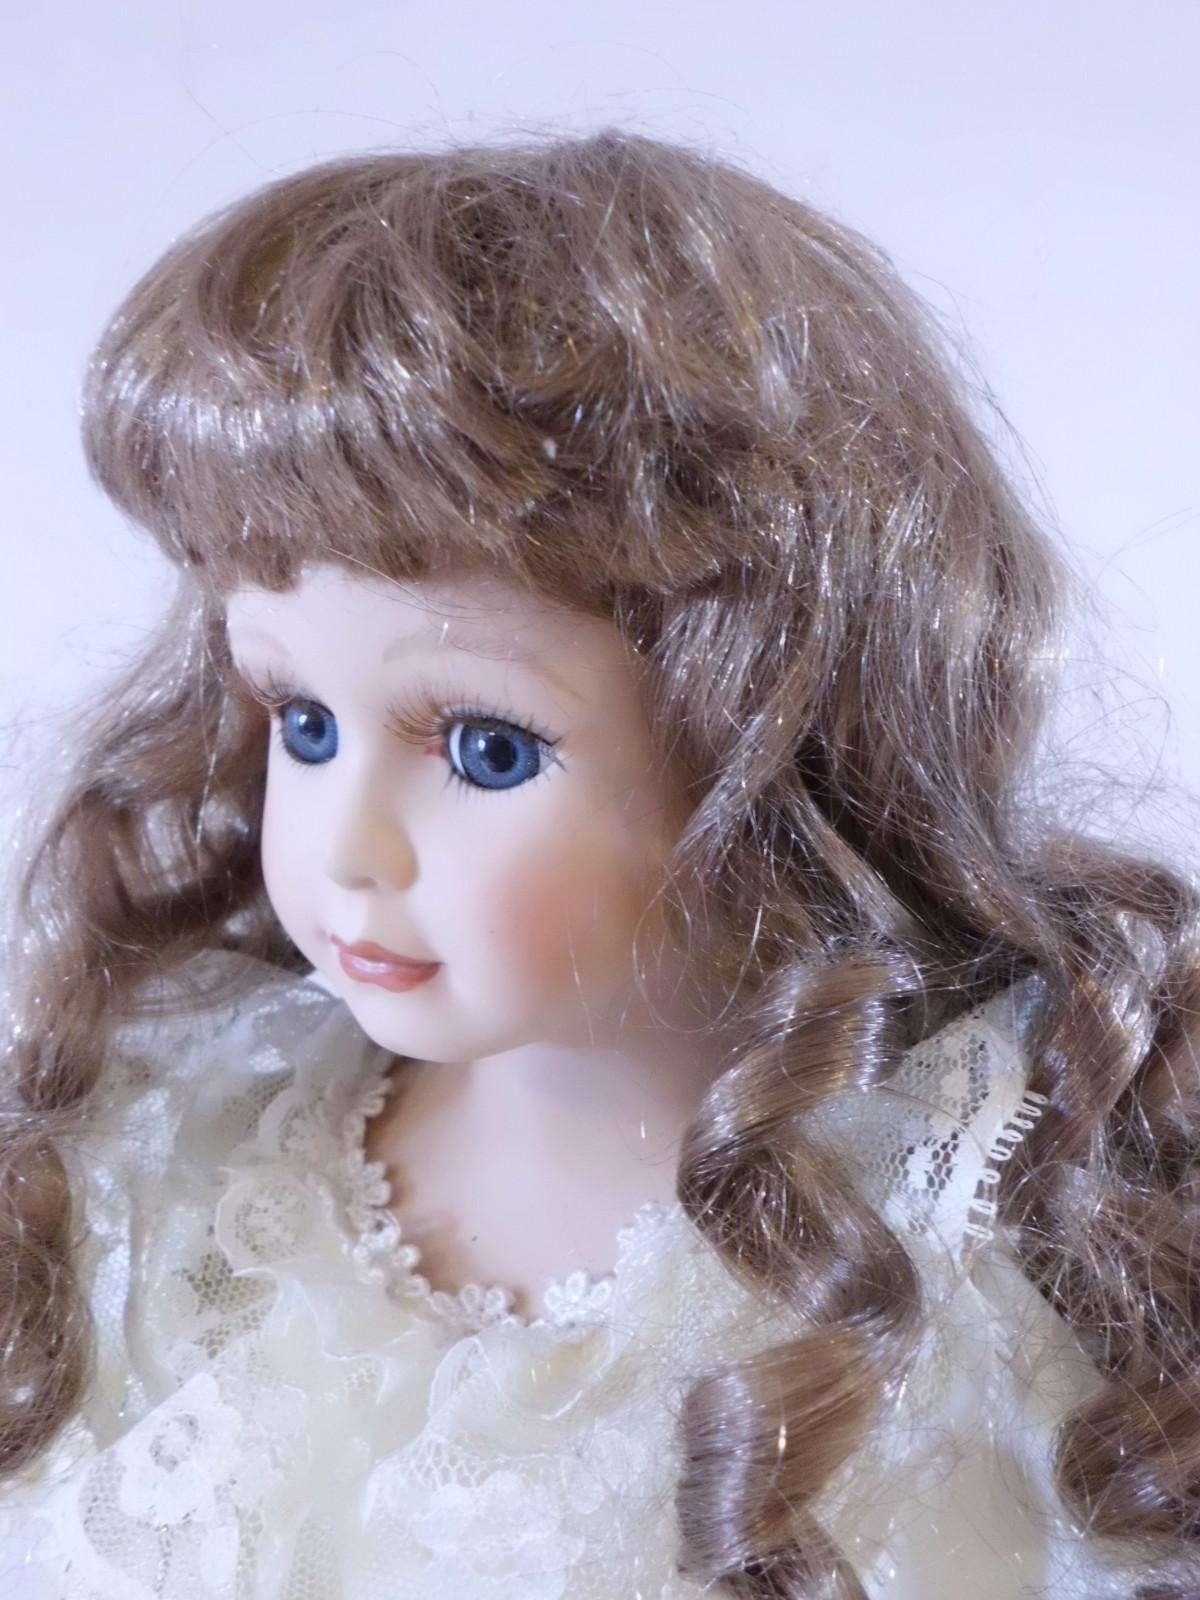 Fotos gratis : cabello, marrón, niño, ropa, juguete, infancia, peinado, pelo largo, cara, muñeca ...